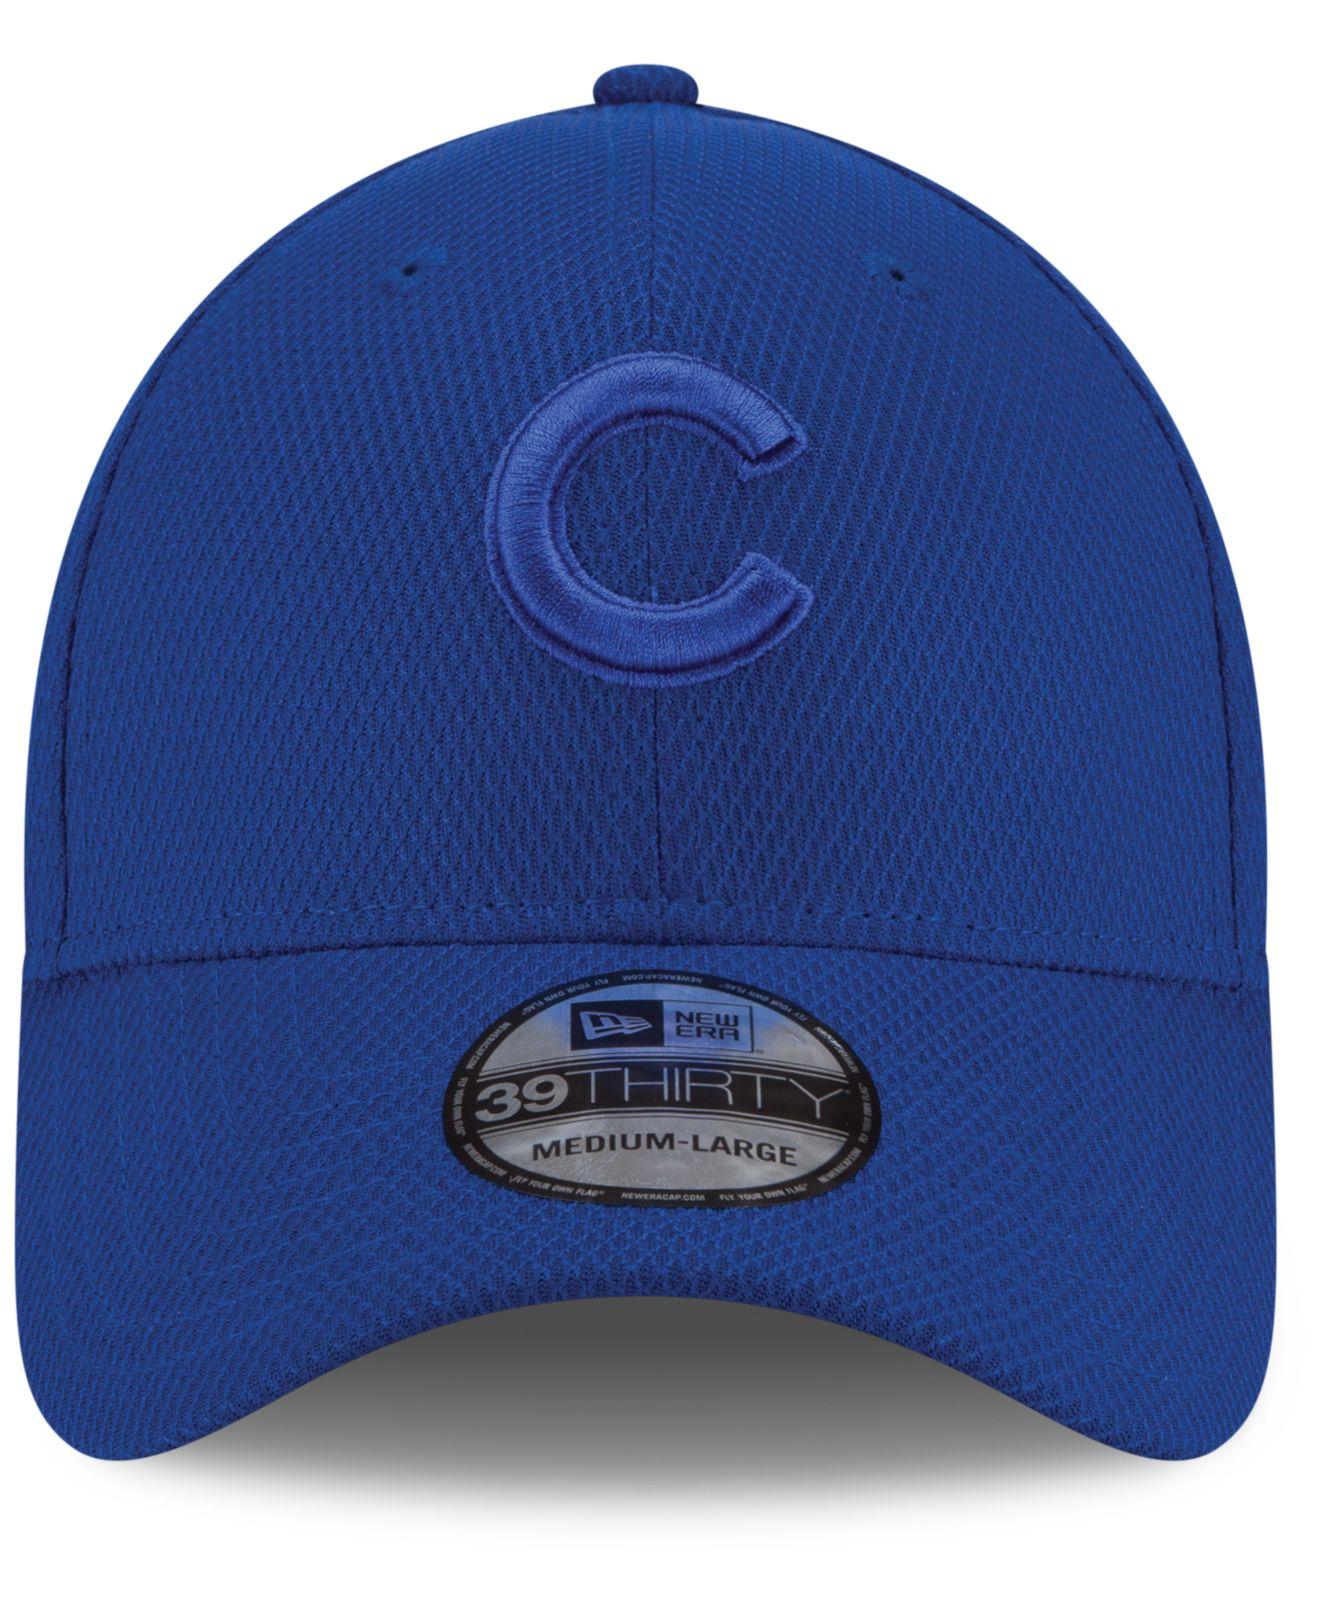 size 40 better reasonable price ireland chicago cubs new era mlb circle reflect 39thirty cap a15f4 ...